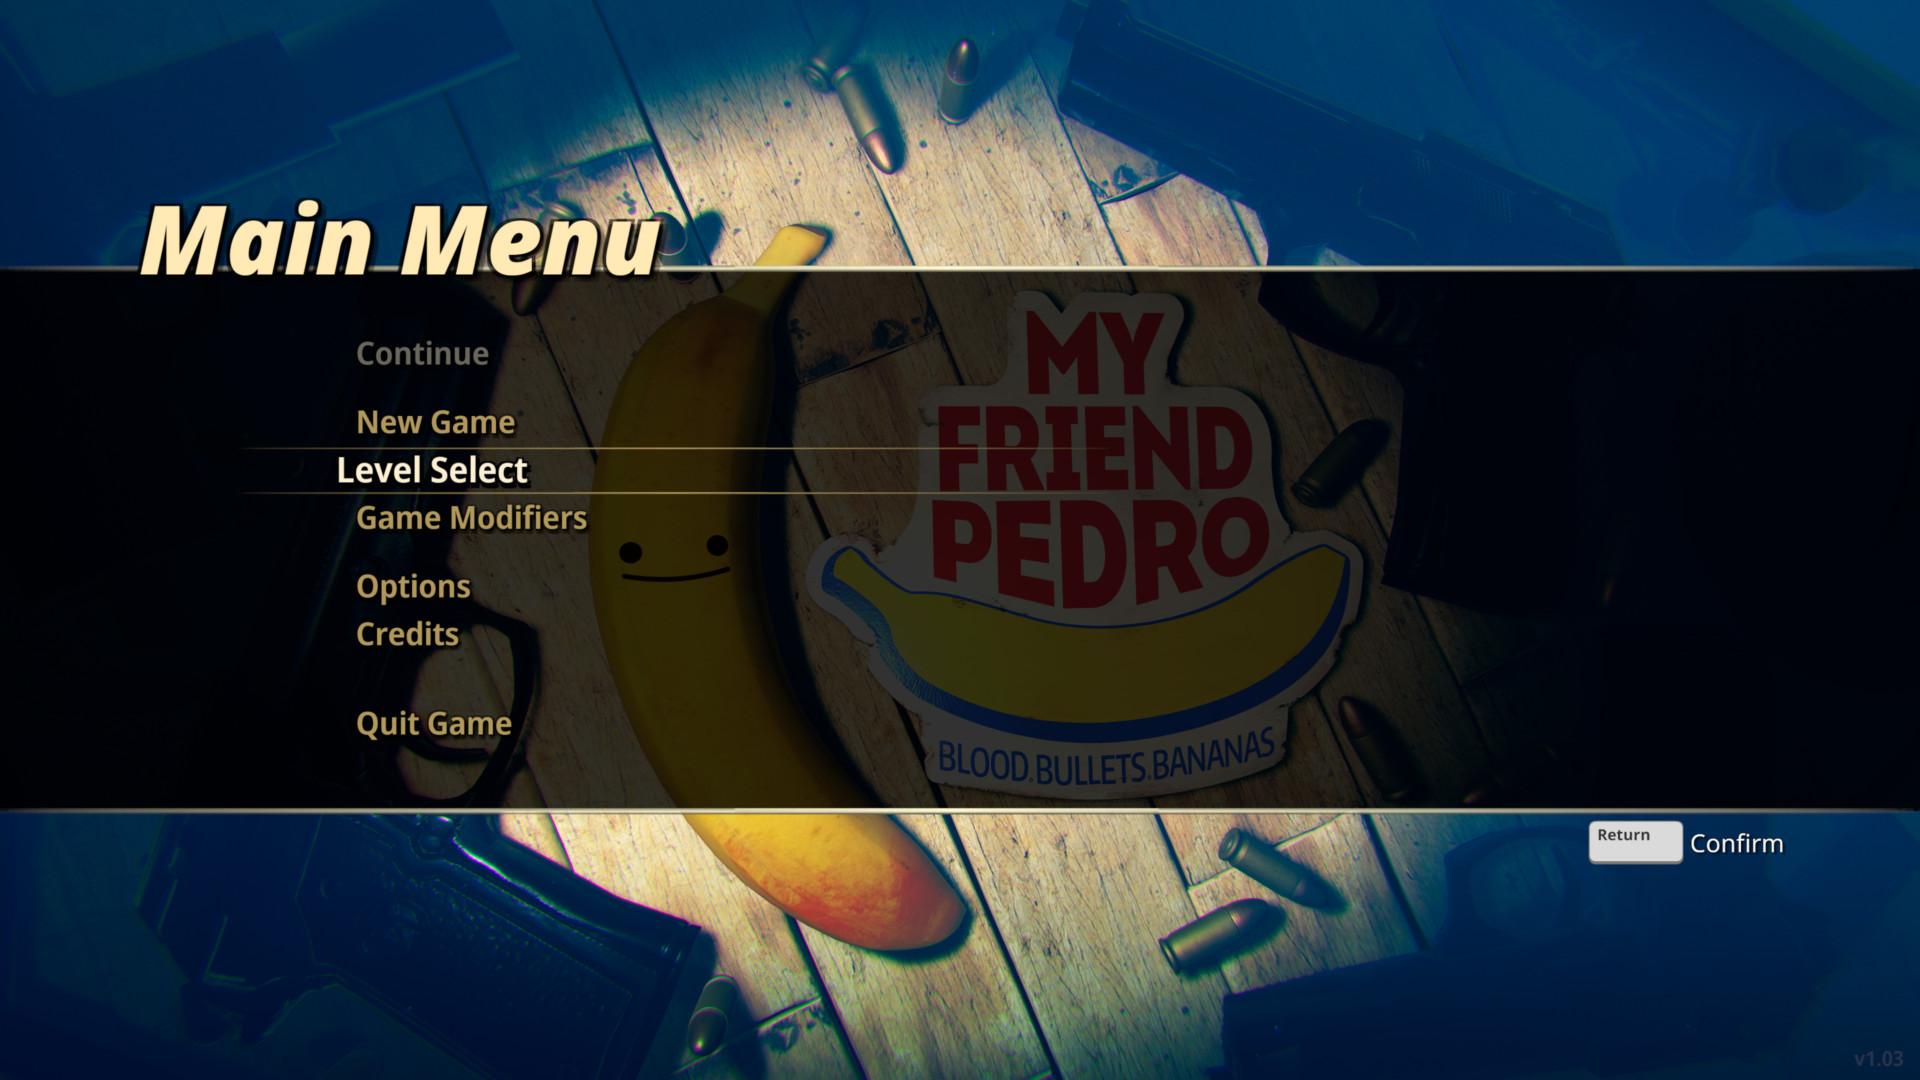 my-friend-pedro-main-menu